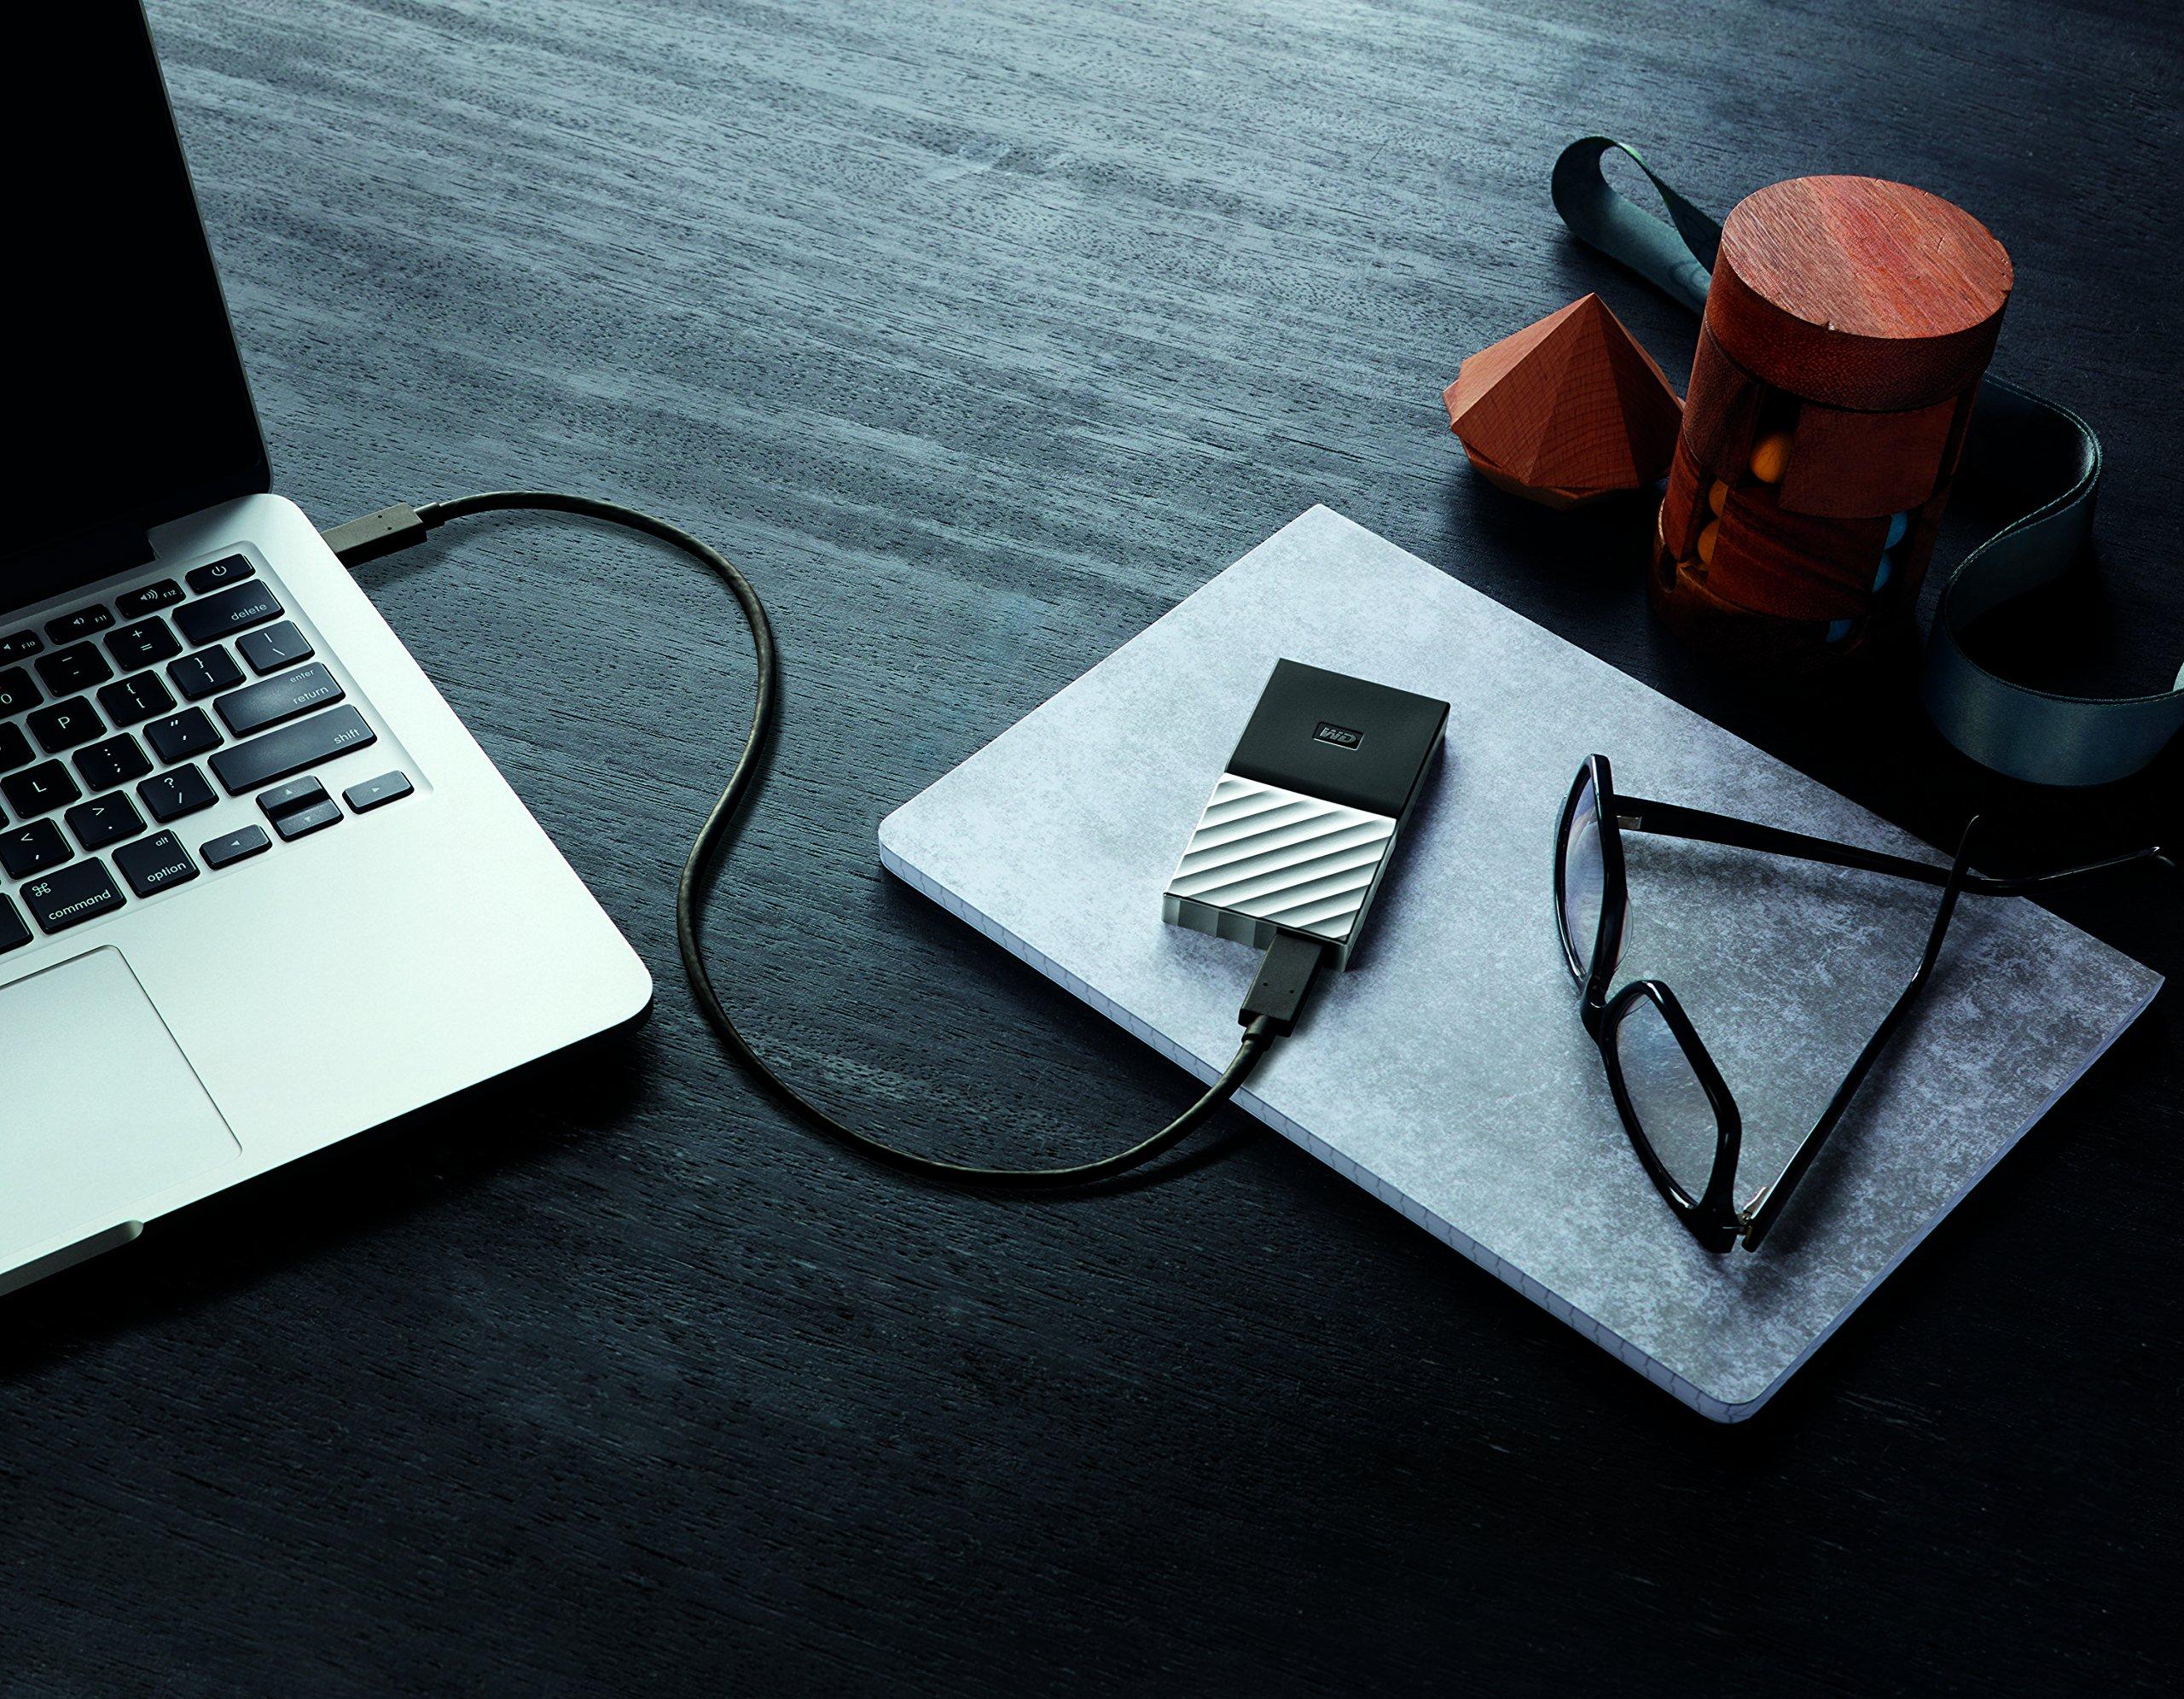 WDBKVX0010PSL-WESN WD 1TB My Passport SSD Portable Storage Black-Gray USB 3.1